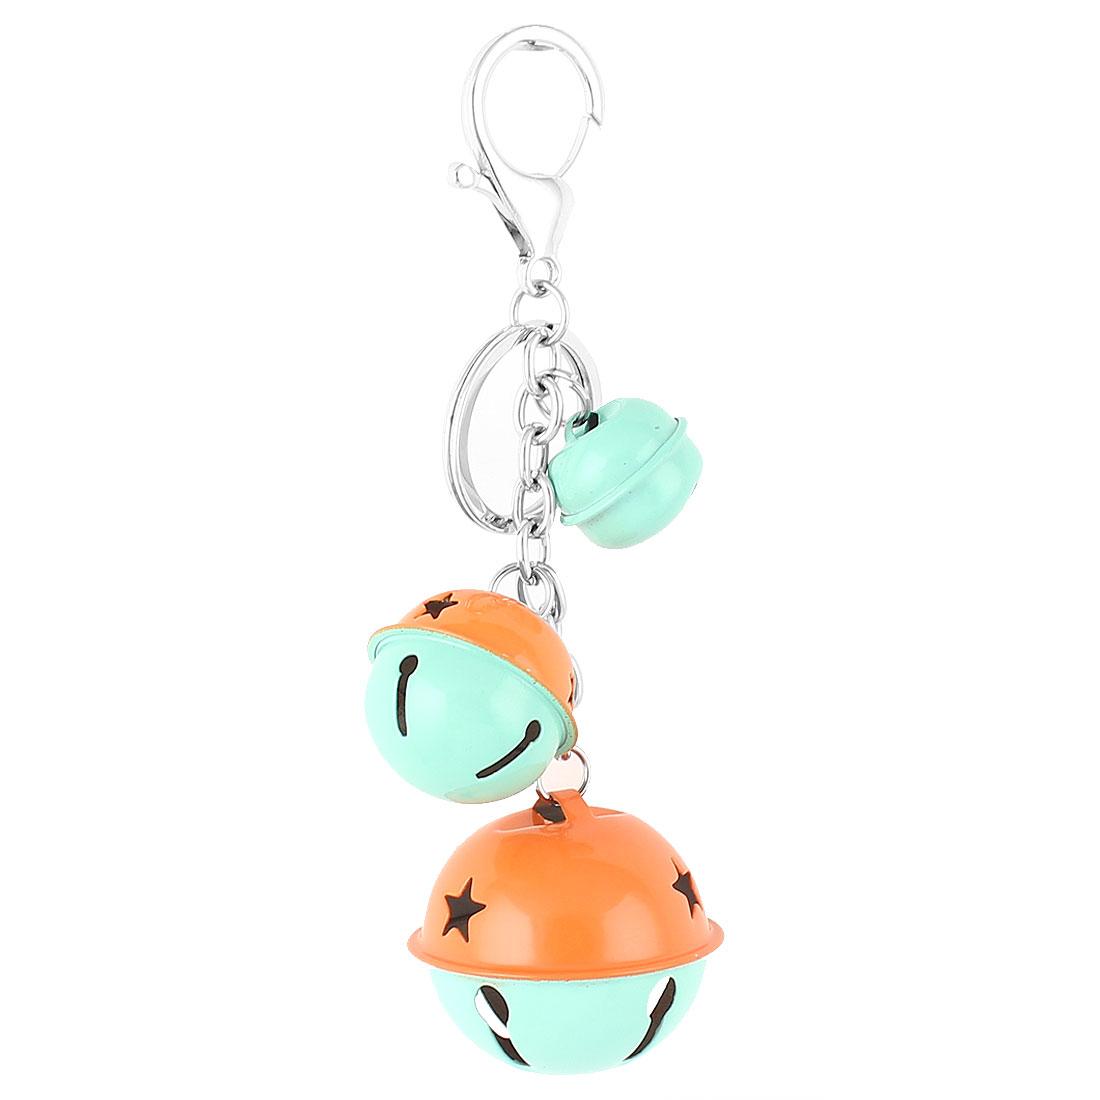 Bells Pendant Swivel Lobster Clasp Keyring Keychain Key Chain Ring Cyan Orange